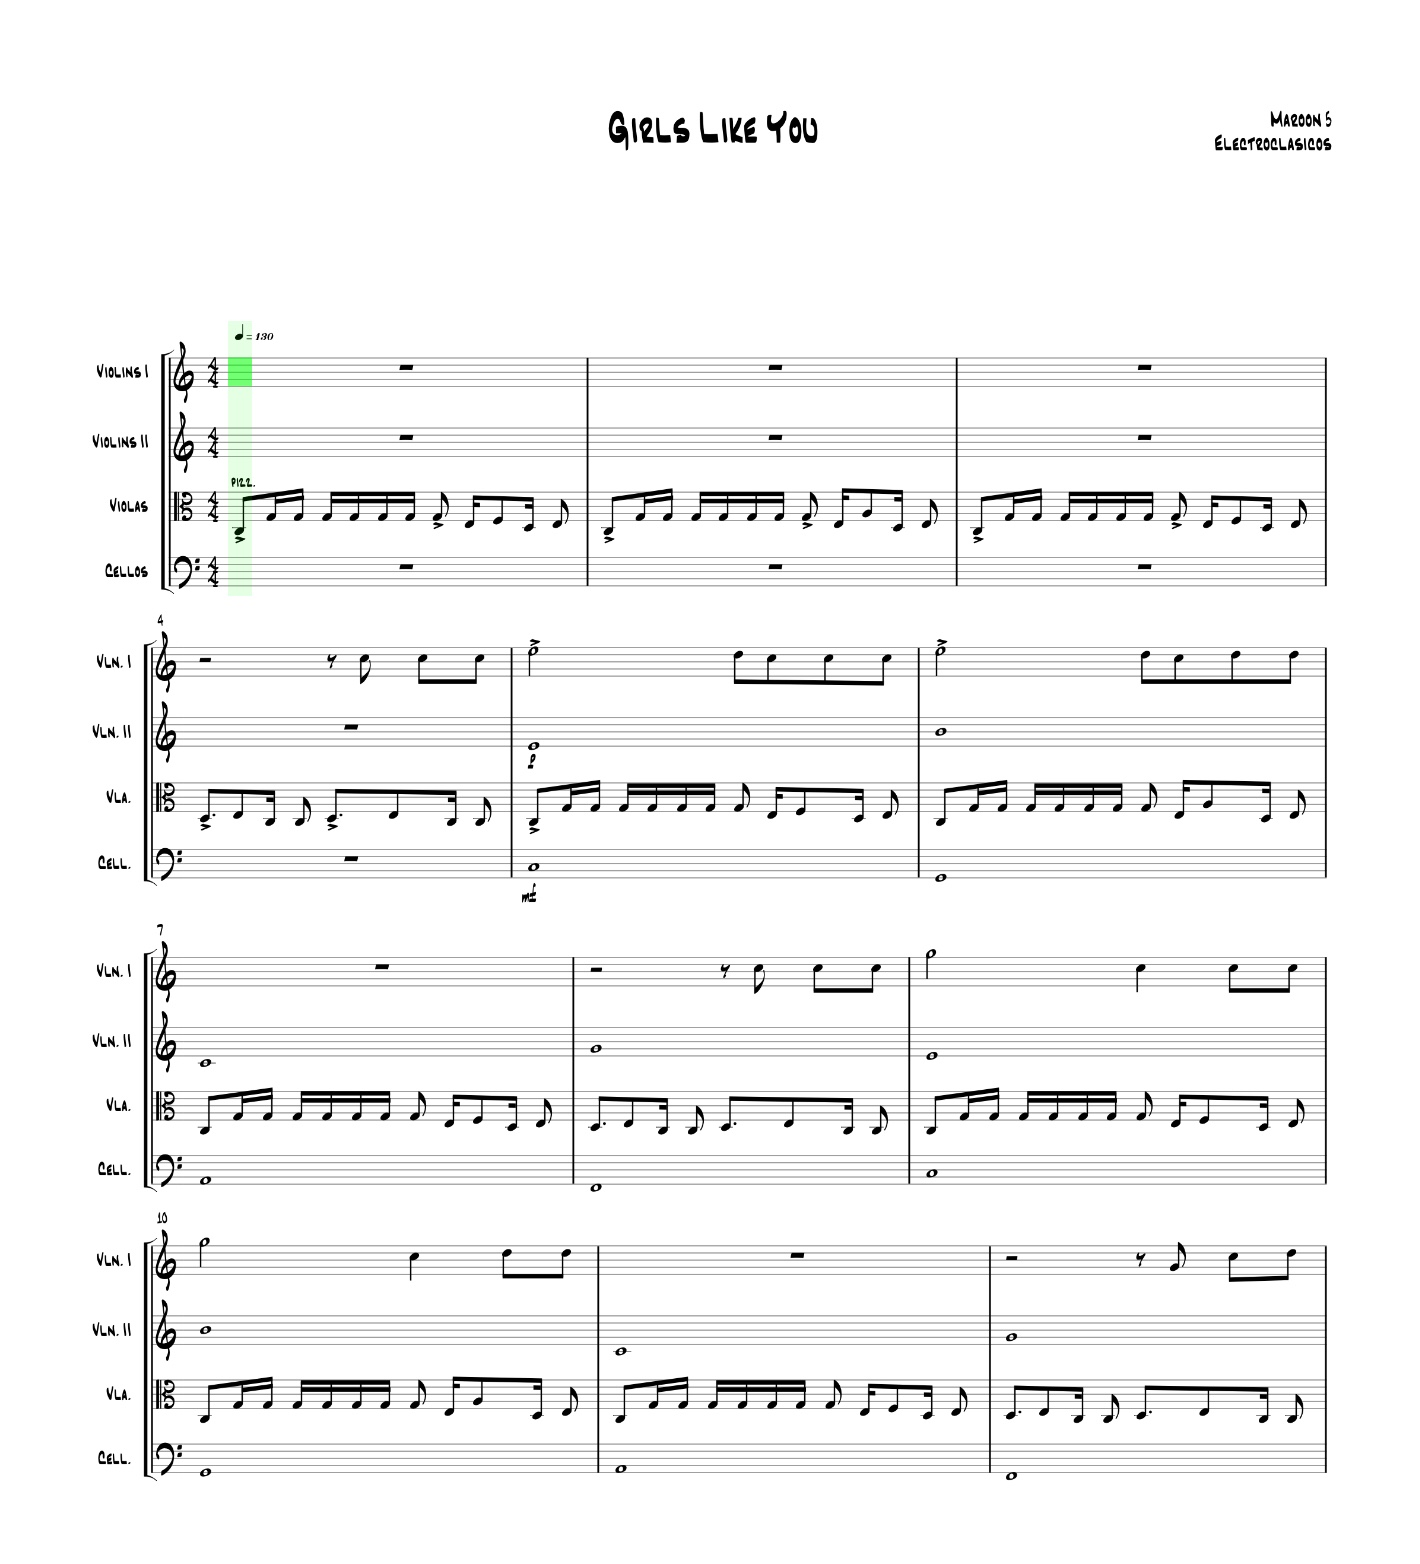 Sheet Music String Quartet Girls Like You, Maroon 5